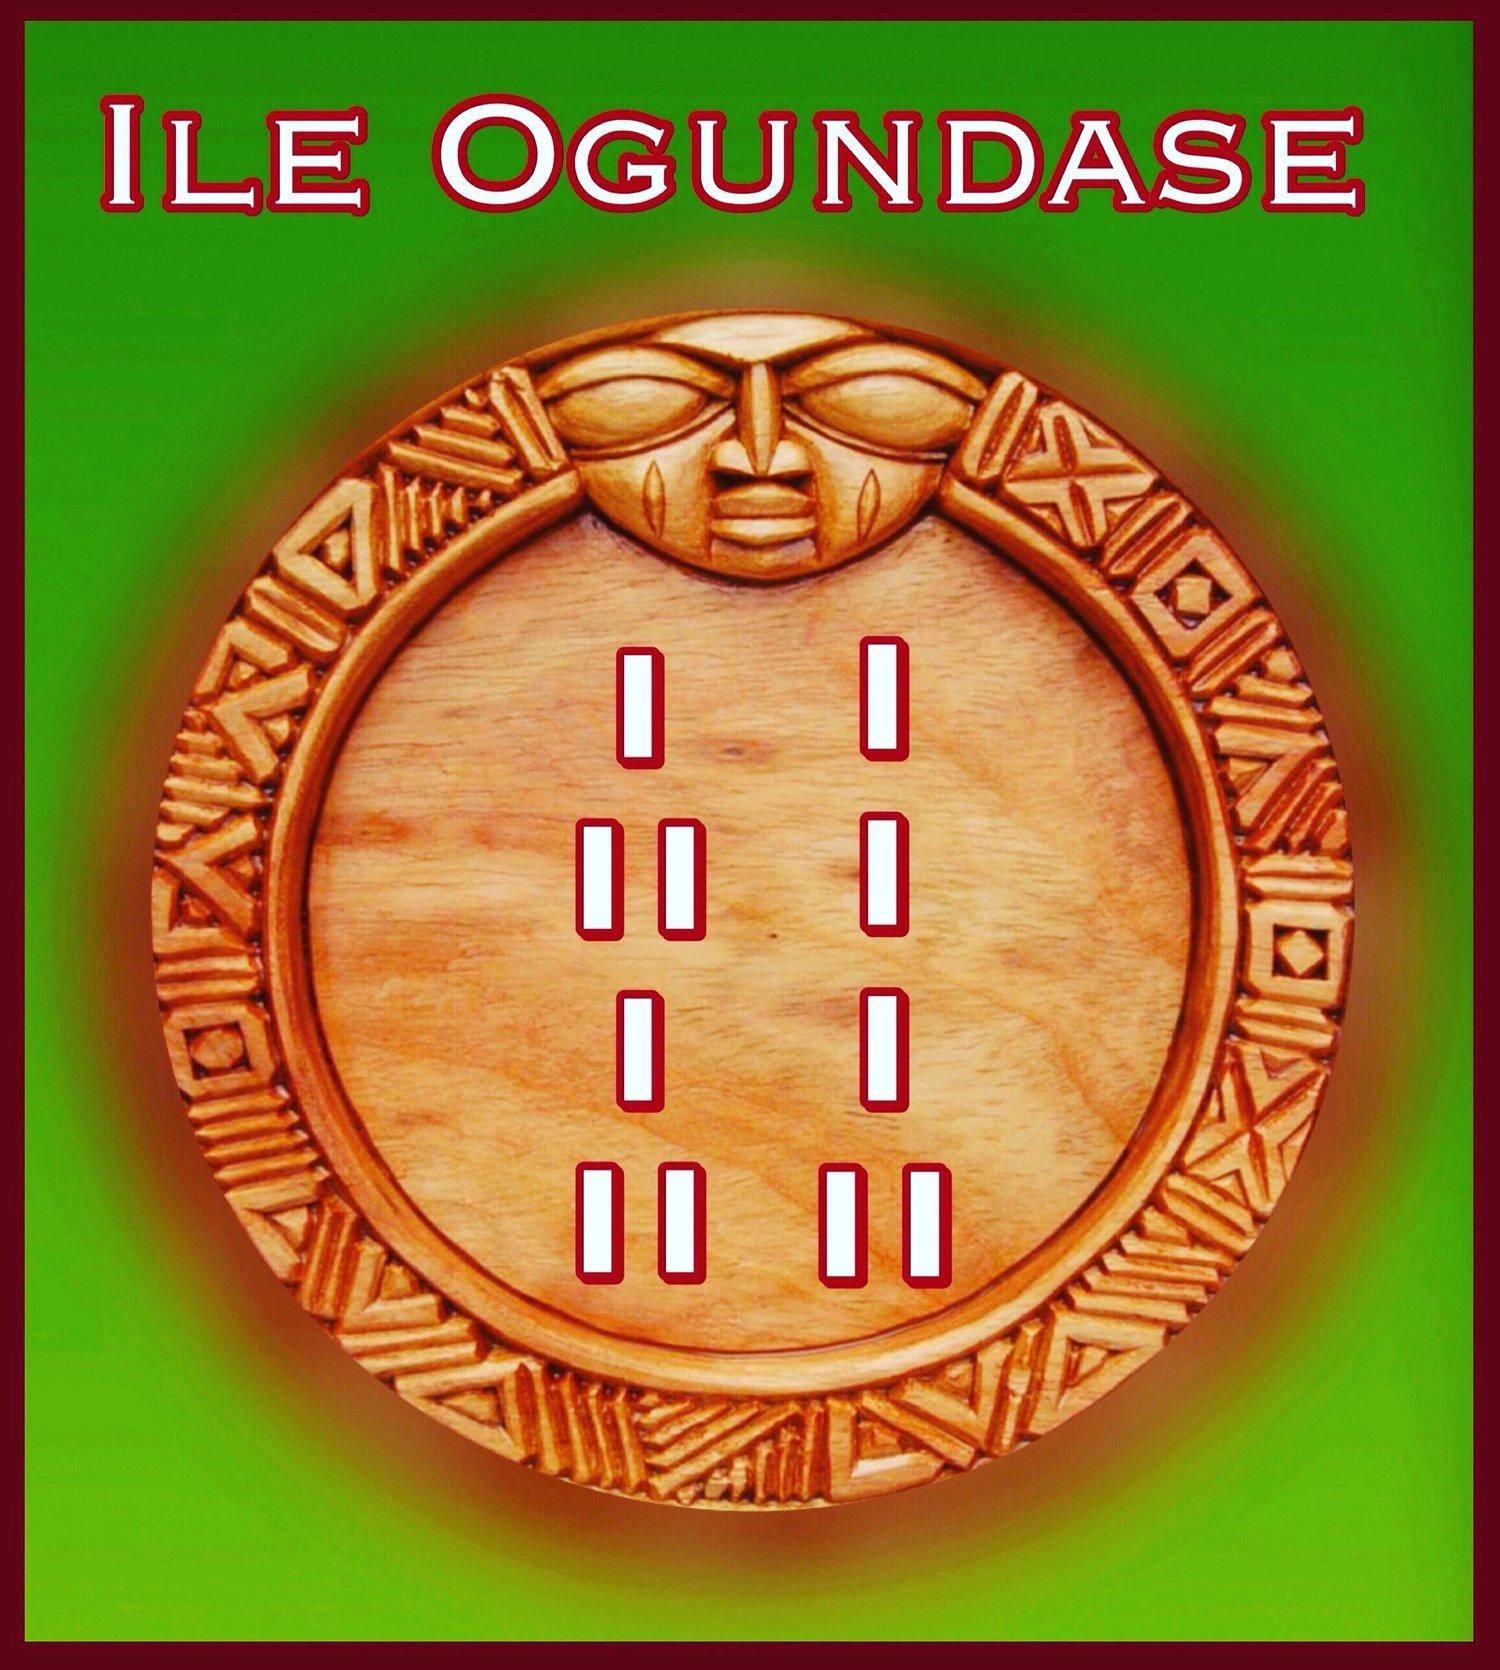 Ogunda Ose: Ifa Temple and Spiritual Healing Center